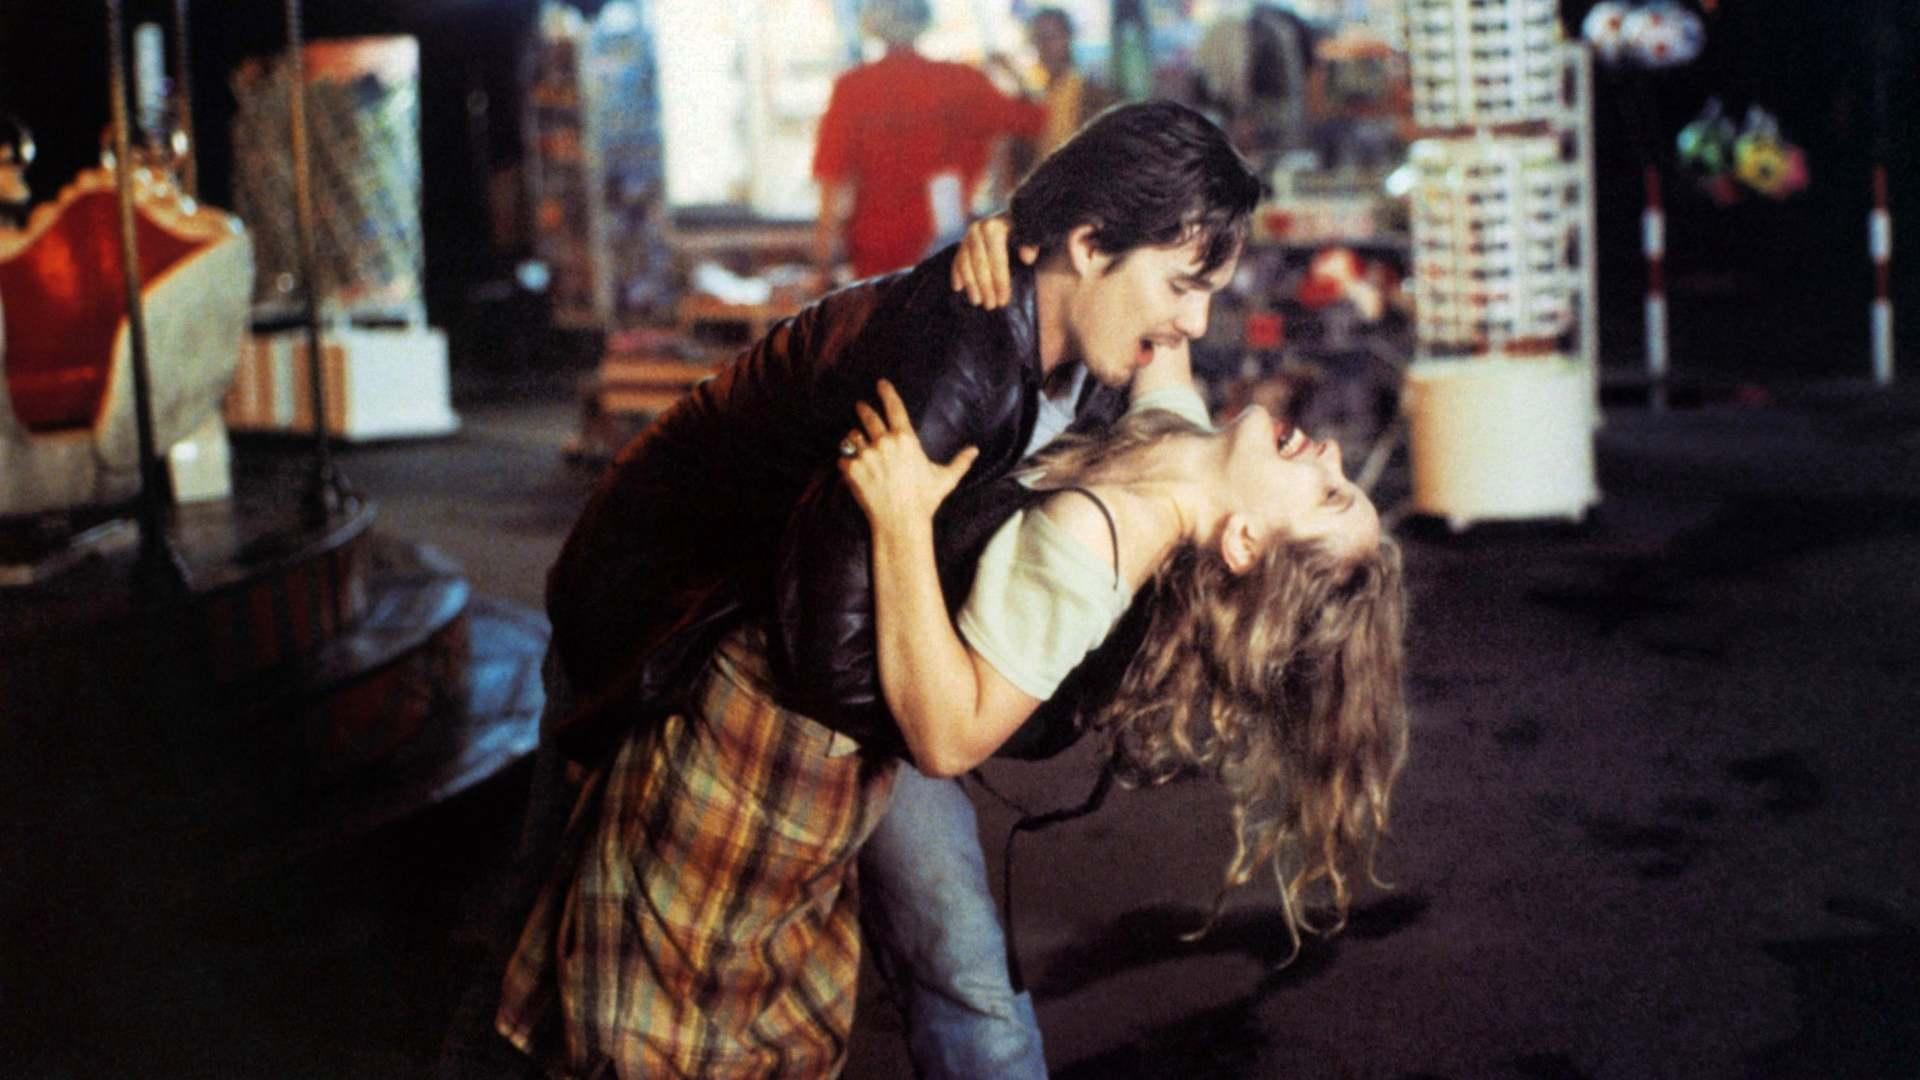 Кадры из фильма Перед рассветом Before Sunrise 1995